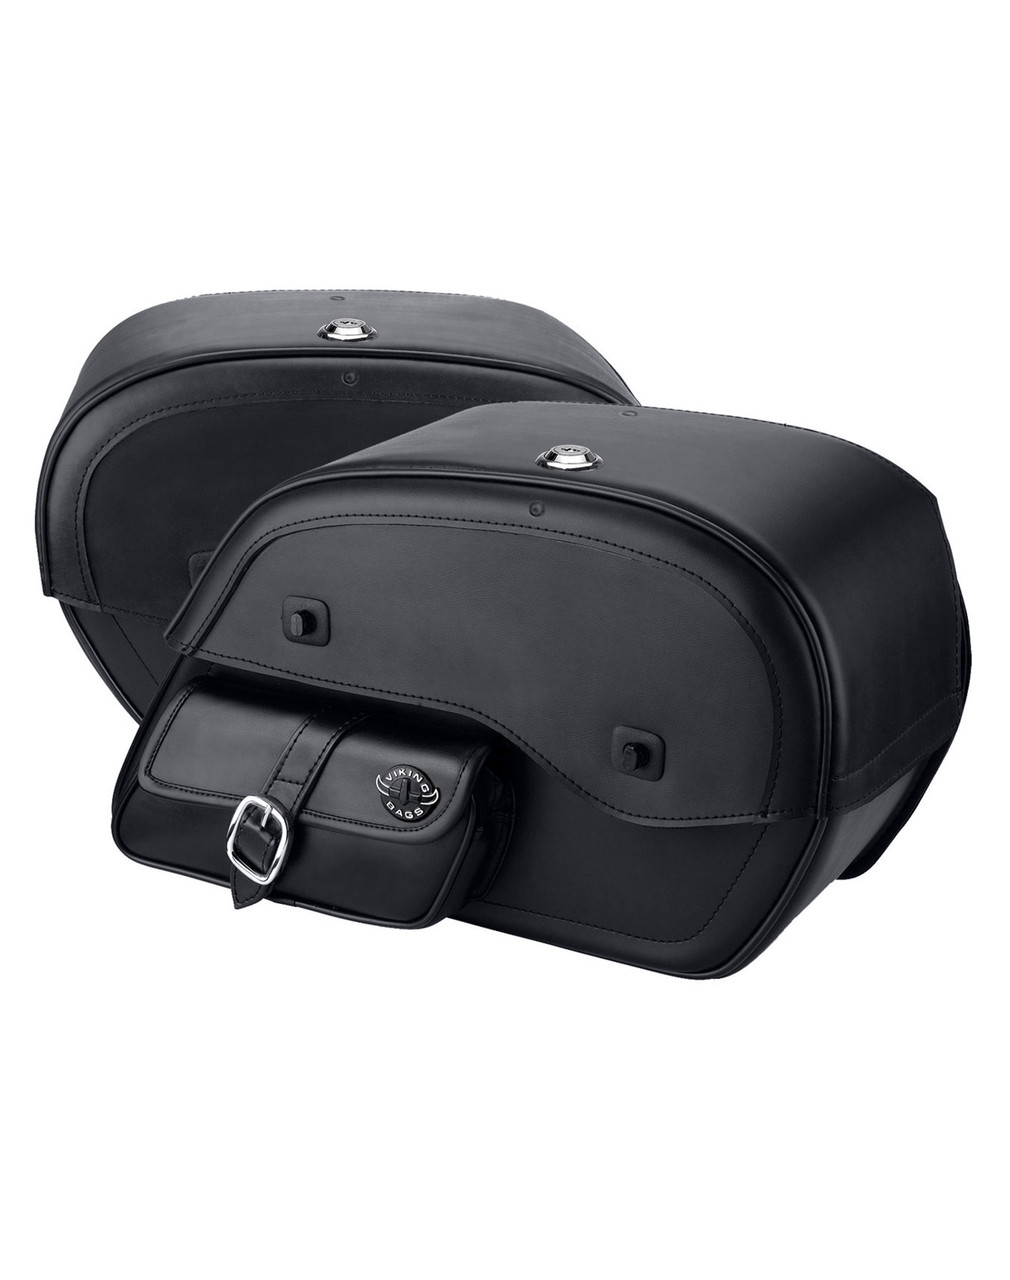 Viking Side Pocket Large Motorcycle Saddlebags For Harley Softail Cross Bones FLSTSB Both Bags View